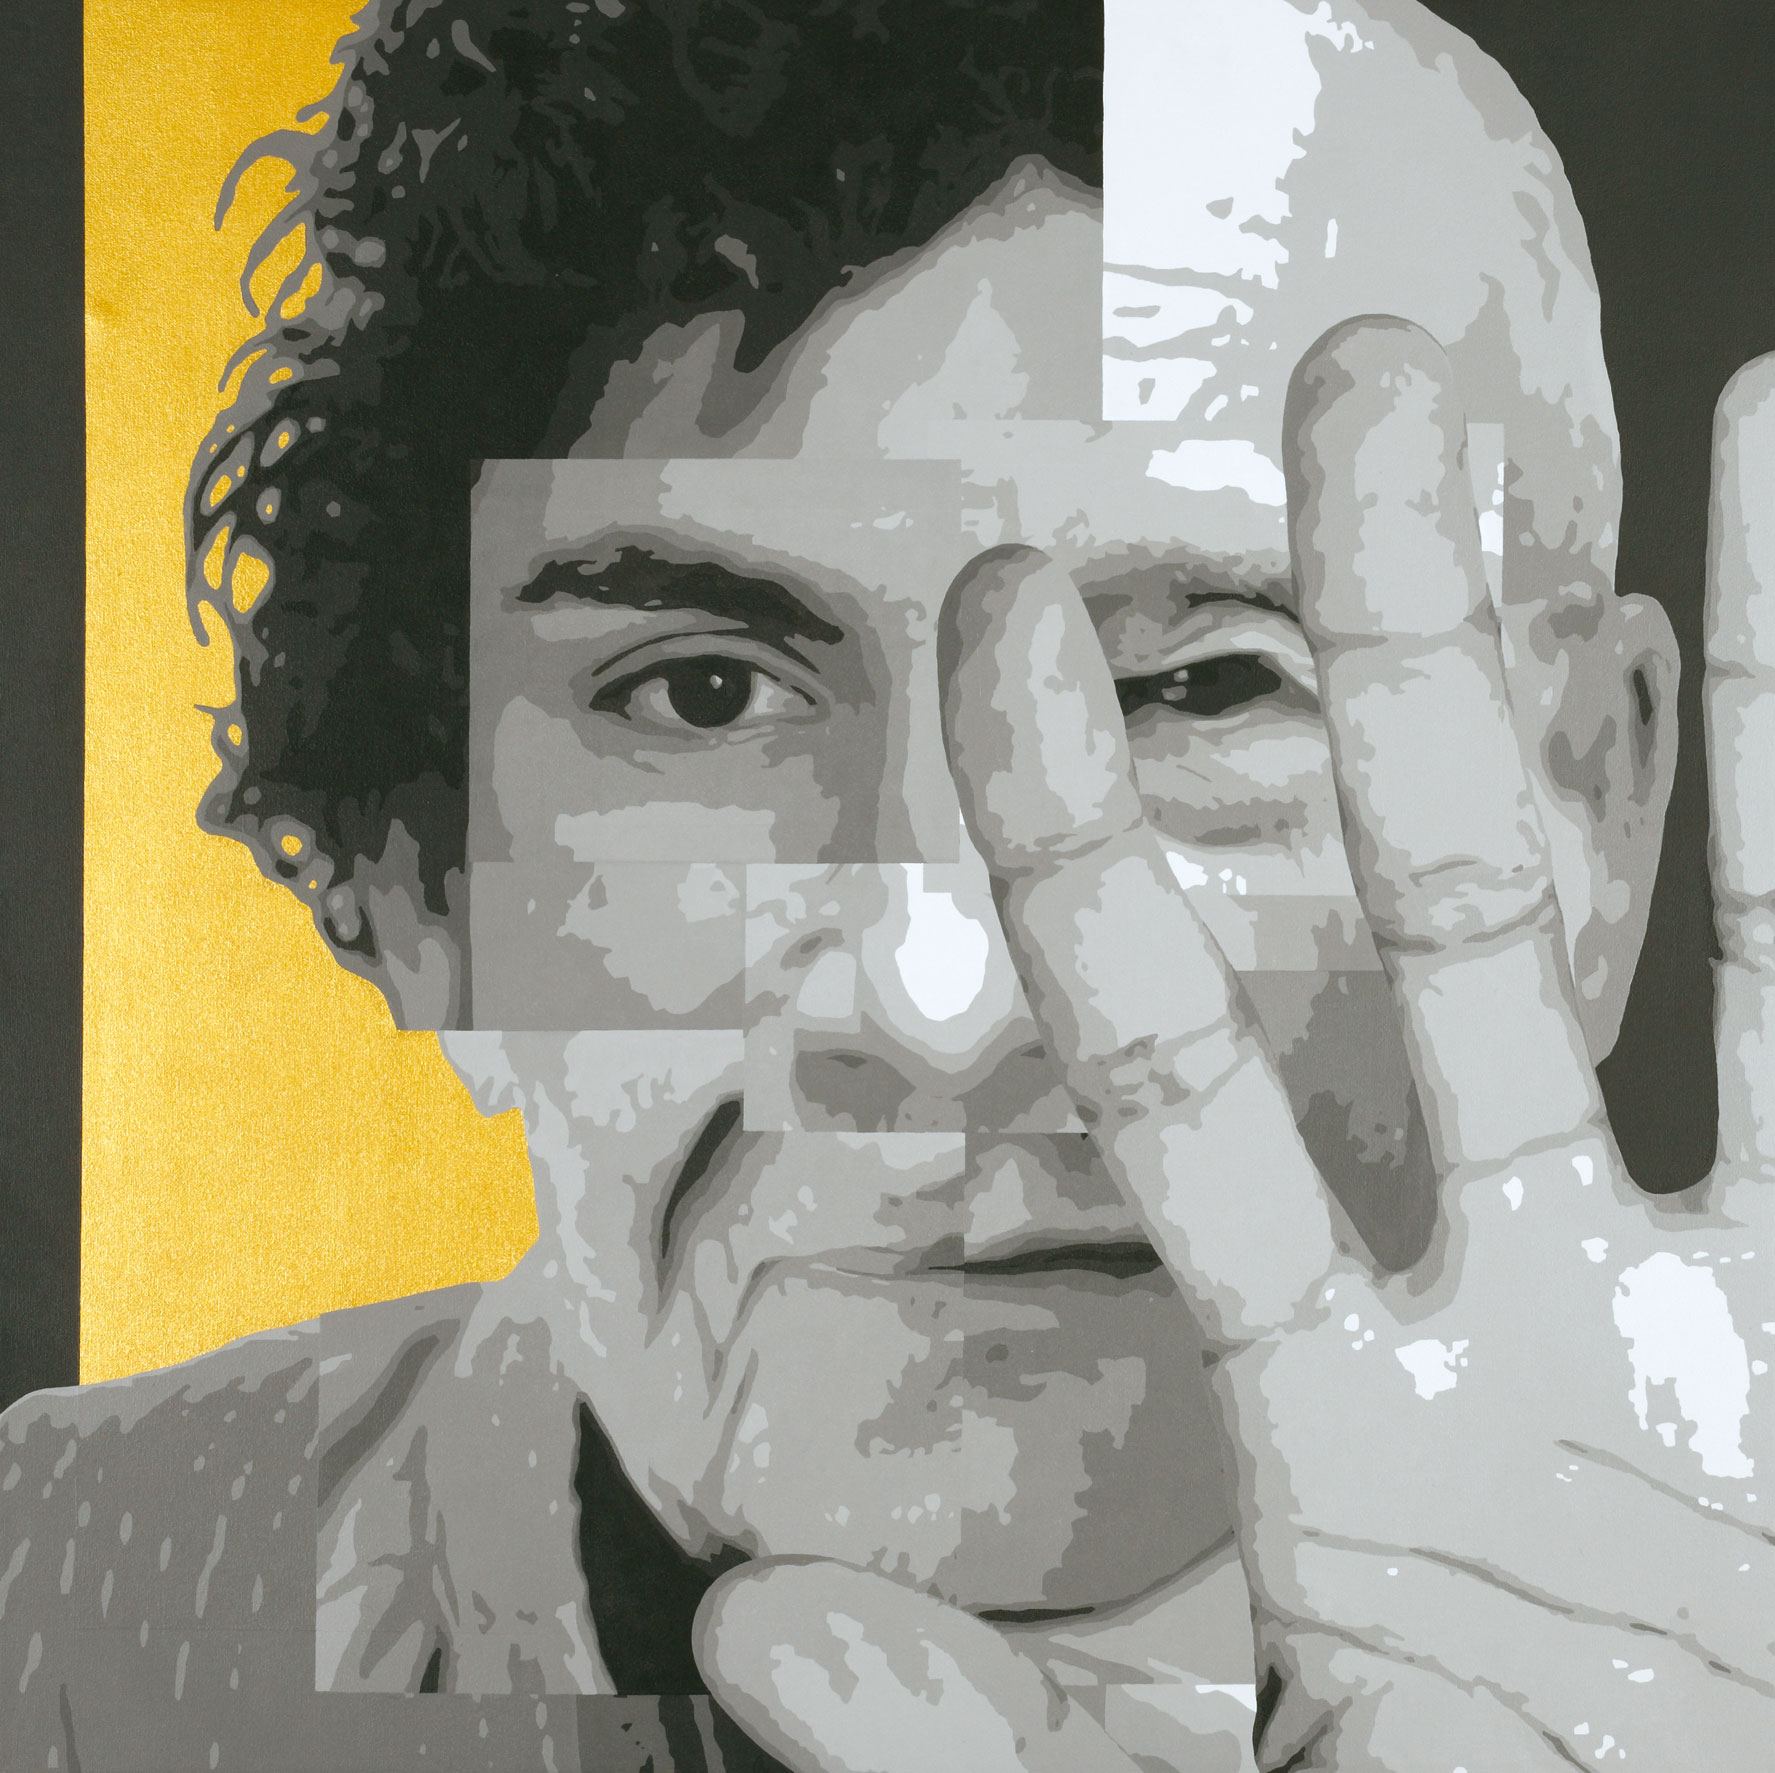 Romain Soussan – Aloïs, 2008